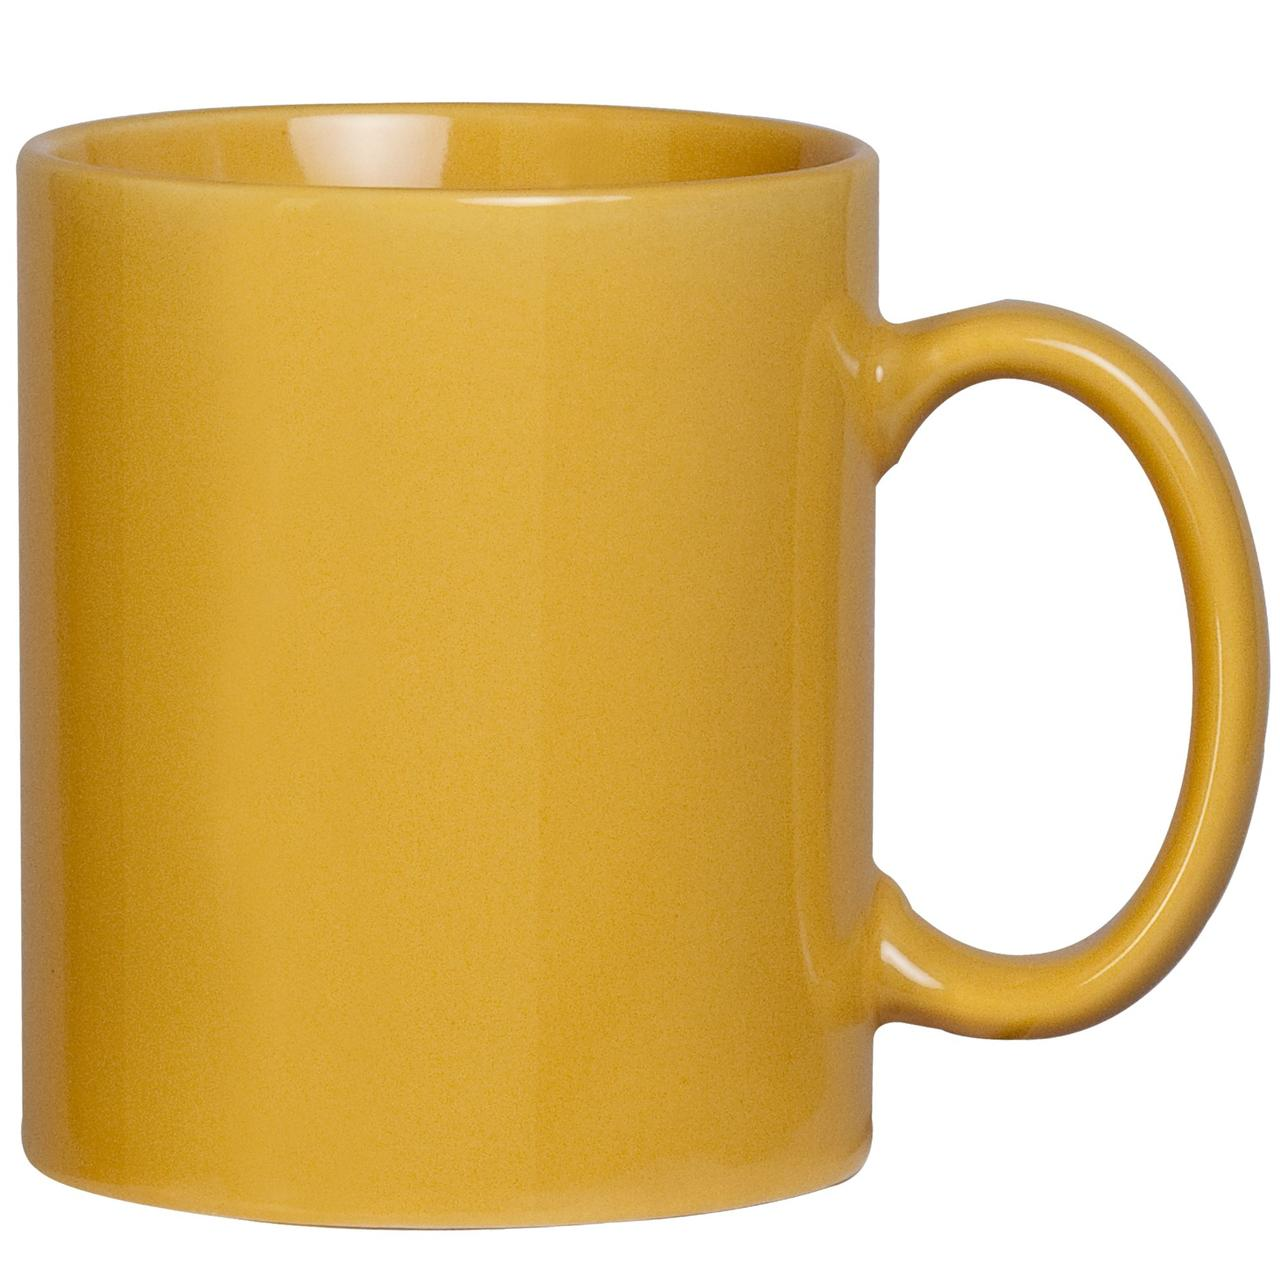 Кружка Promo, желтая (артикул 4534.80)